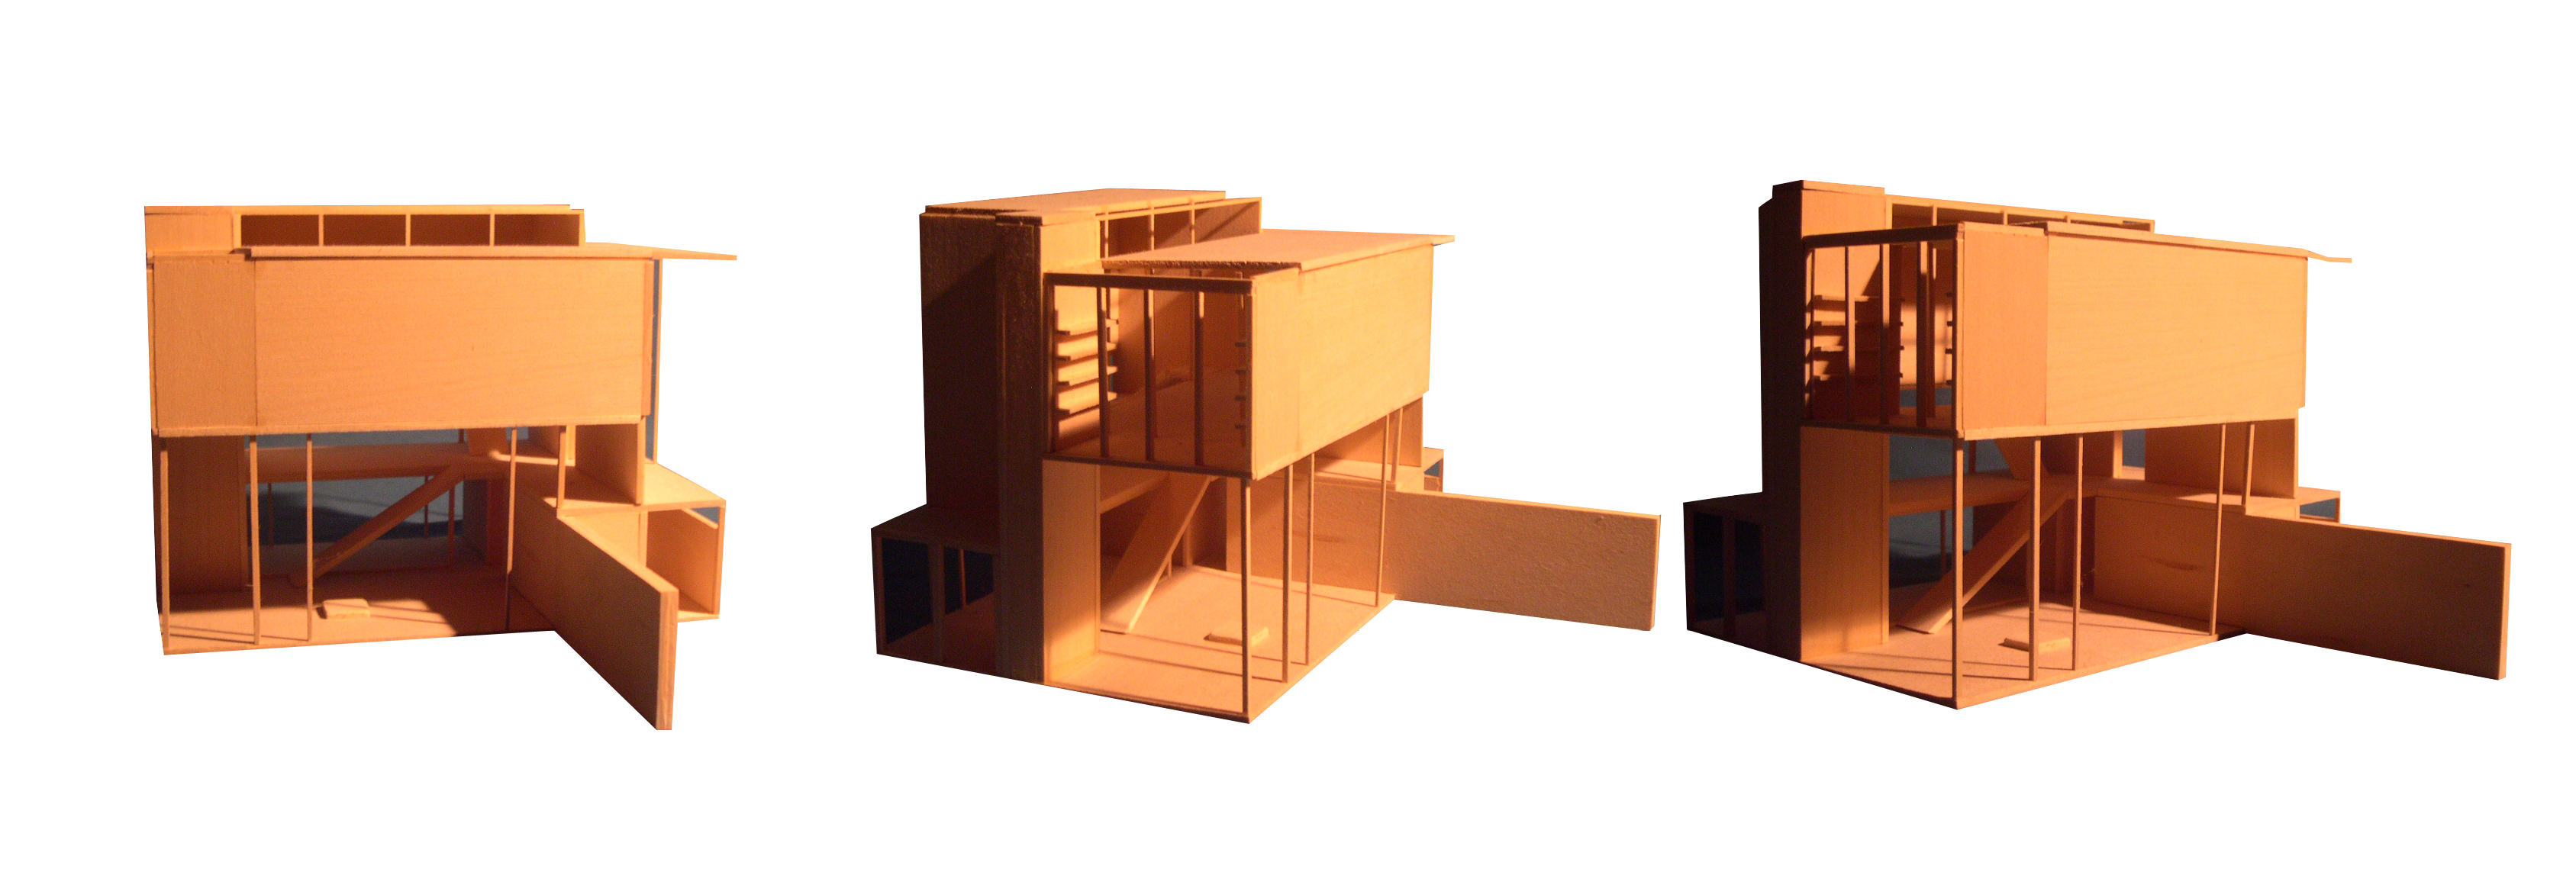 3 Cubes - translation